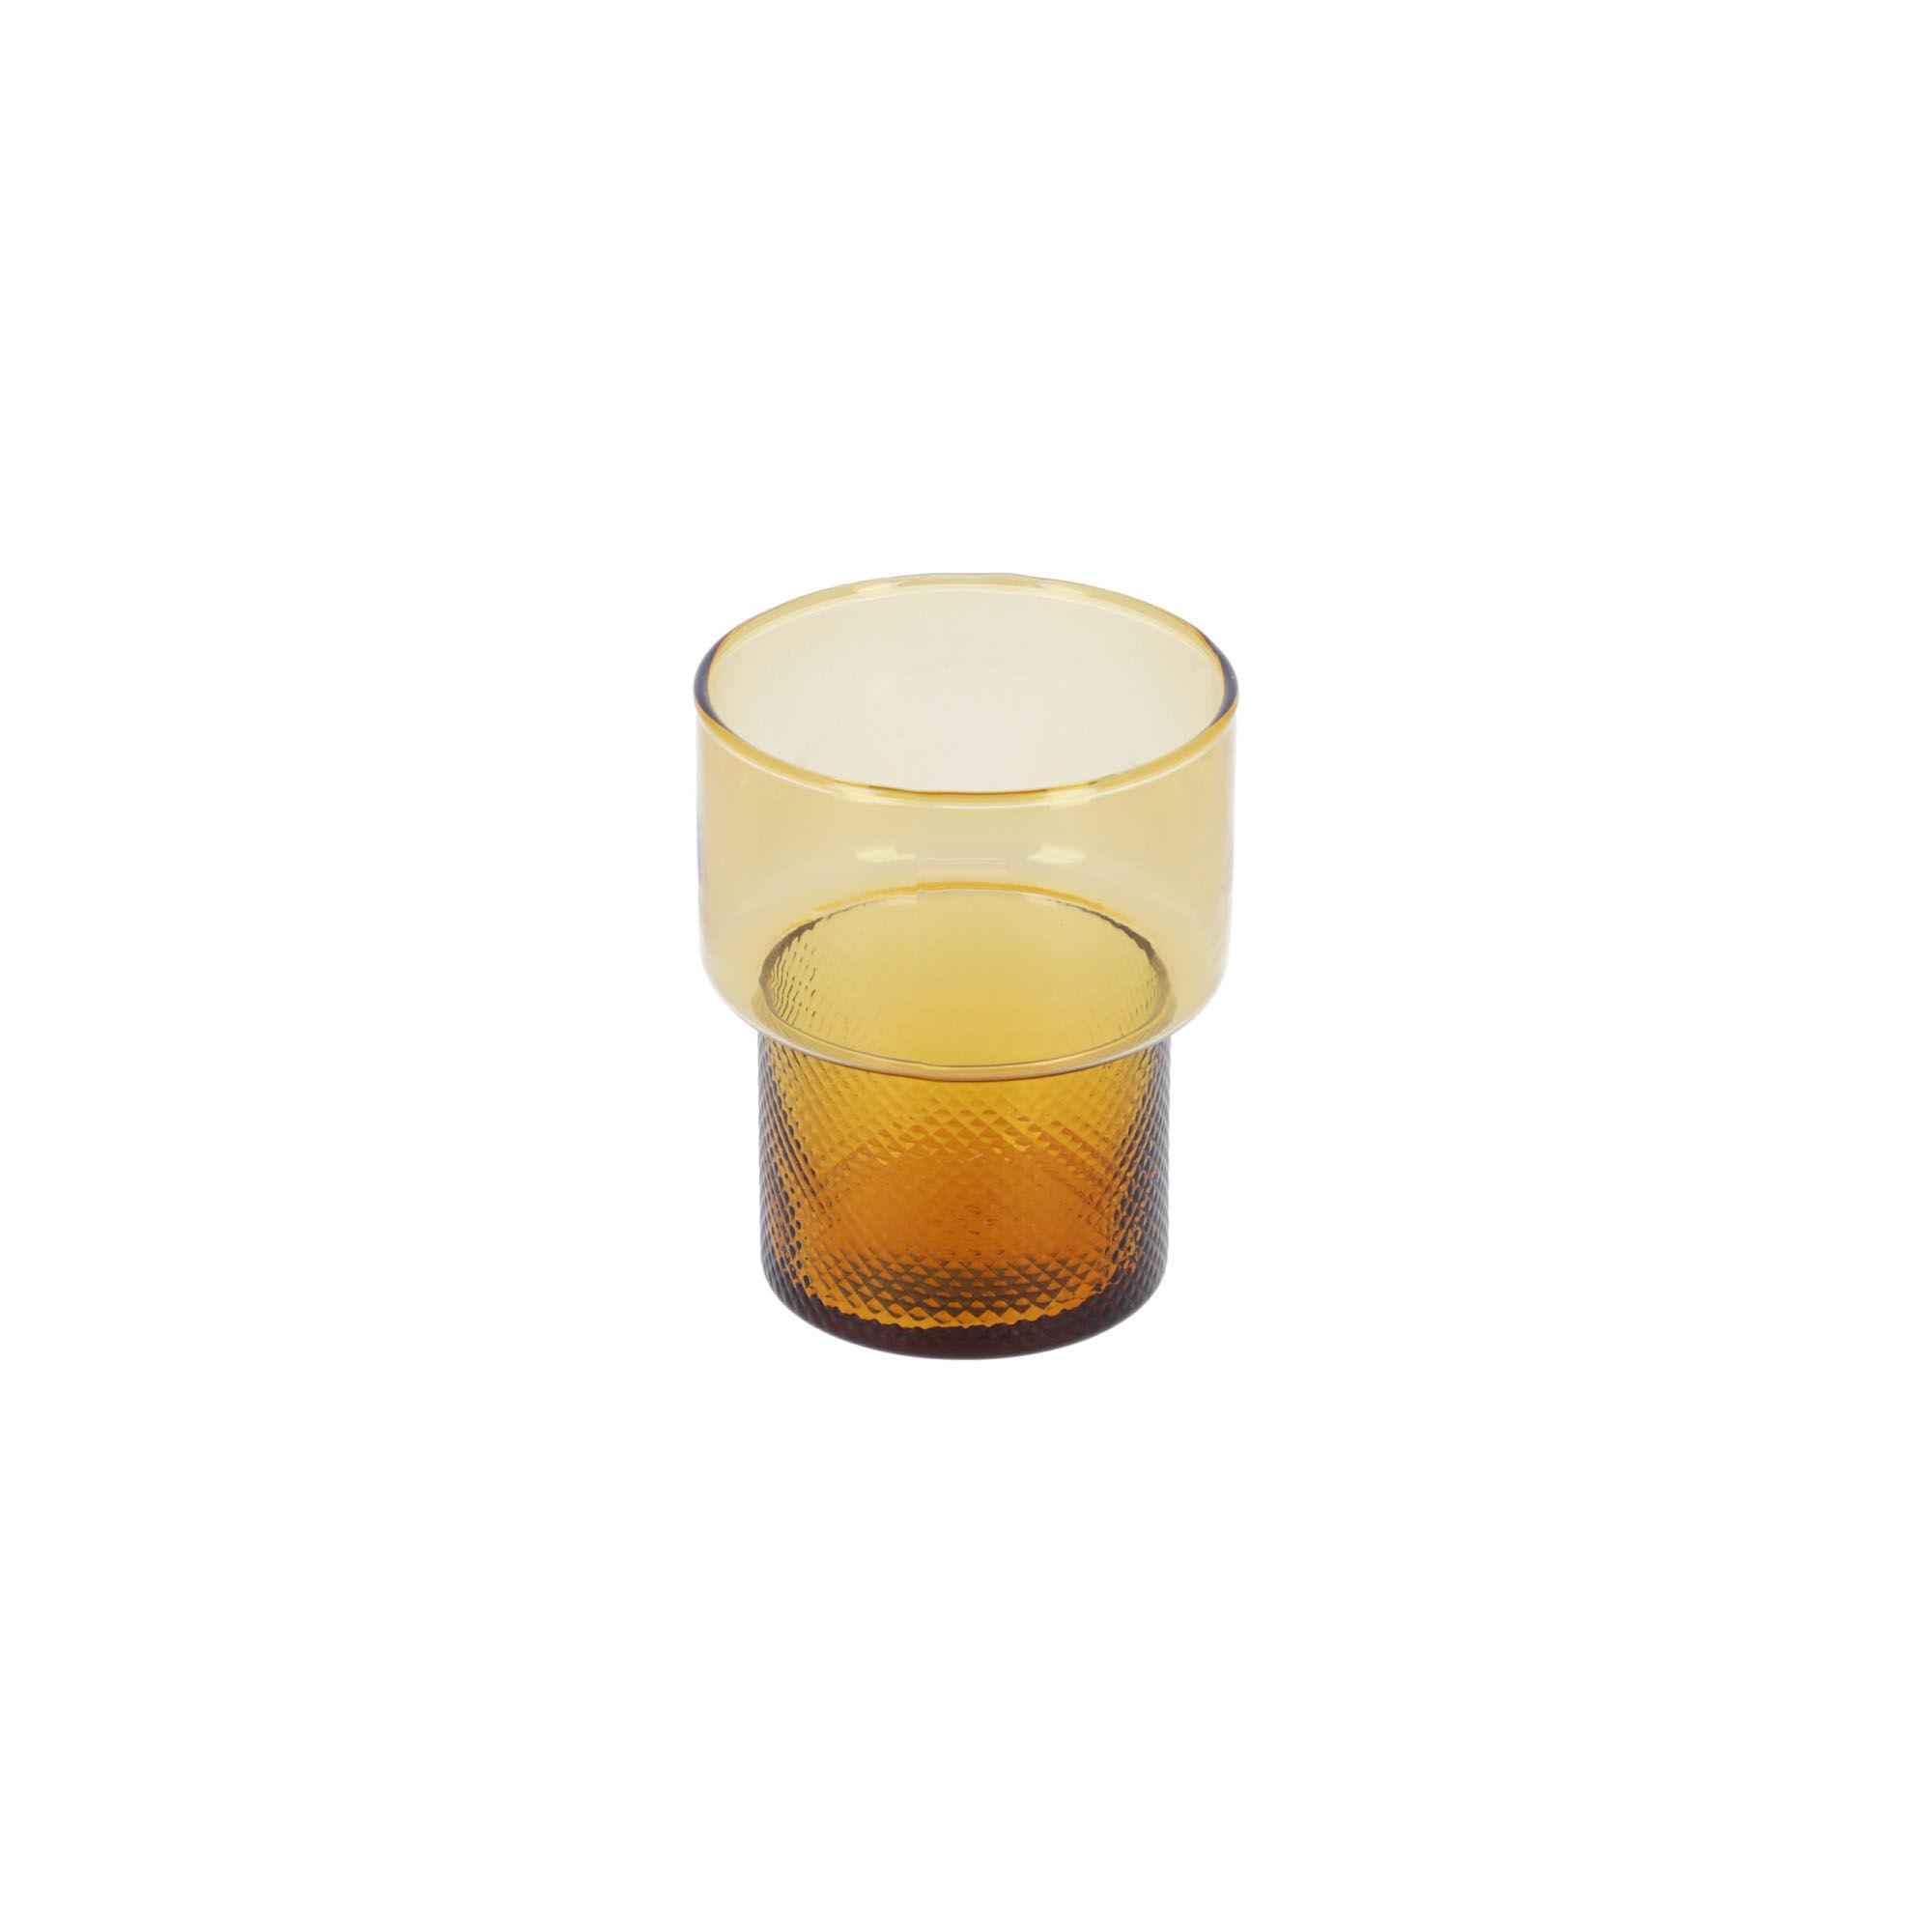 Kave Home Bicchiere Nausica piccolo